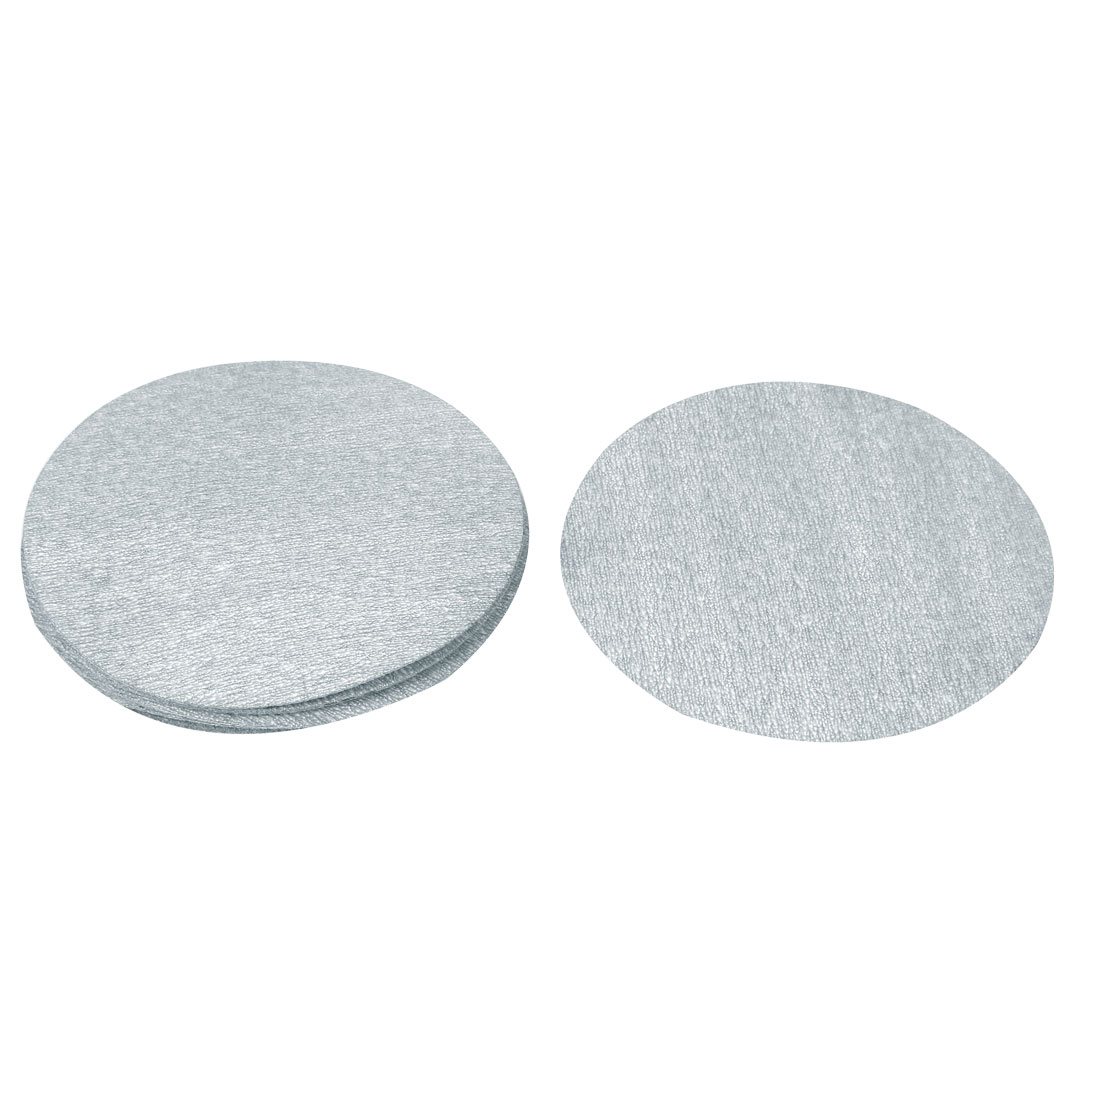 5inch Dia Round Dry Abrasive Sanding Flocking Sandpaper Disc 1000 Grit 10pcs